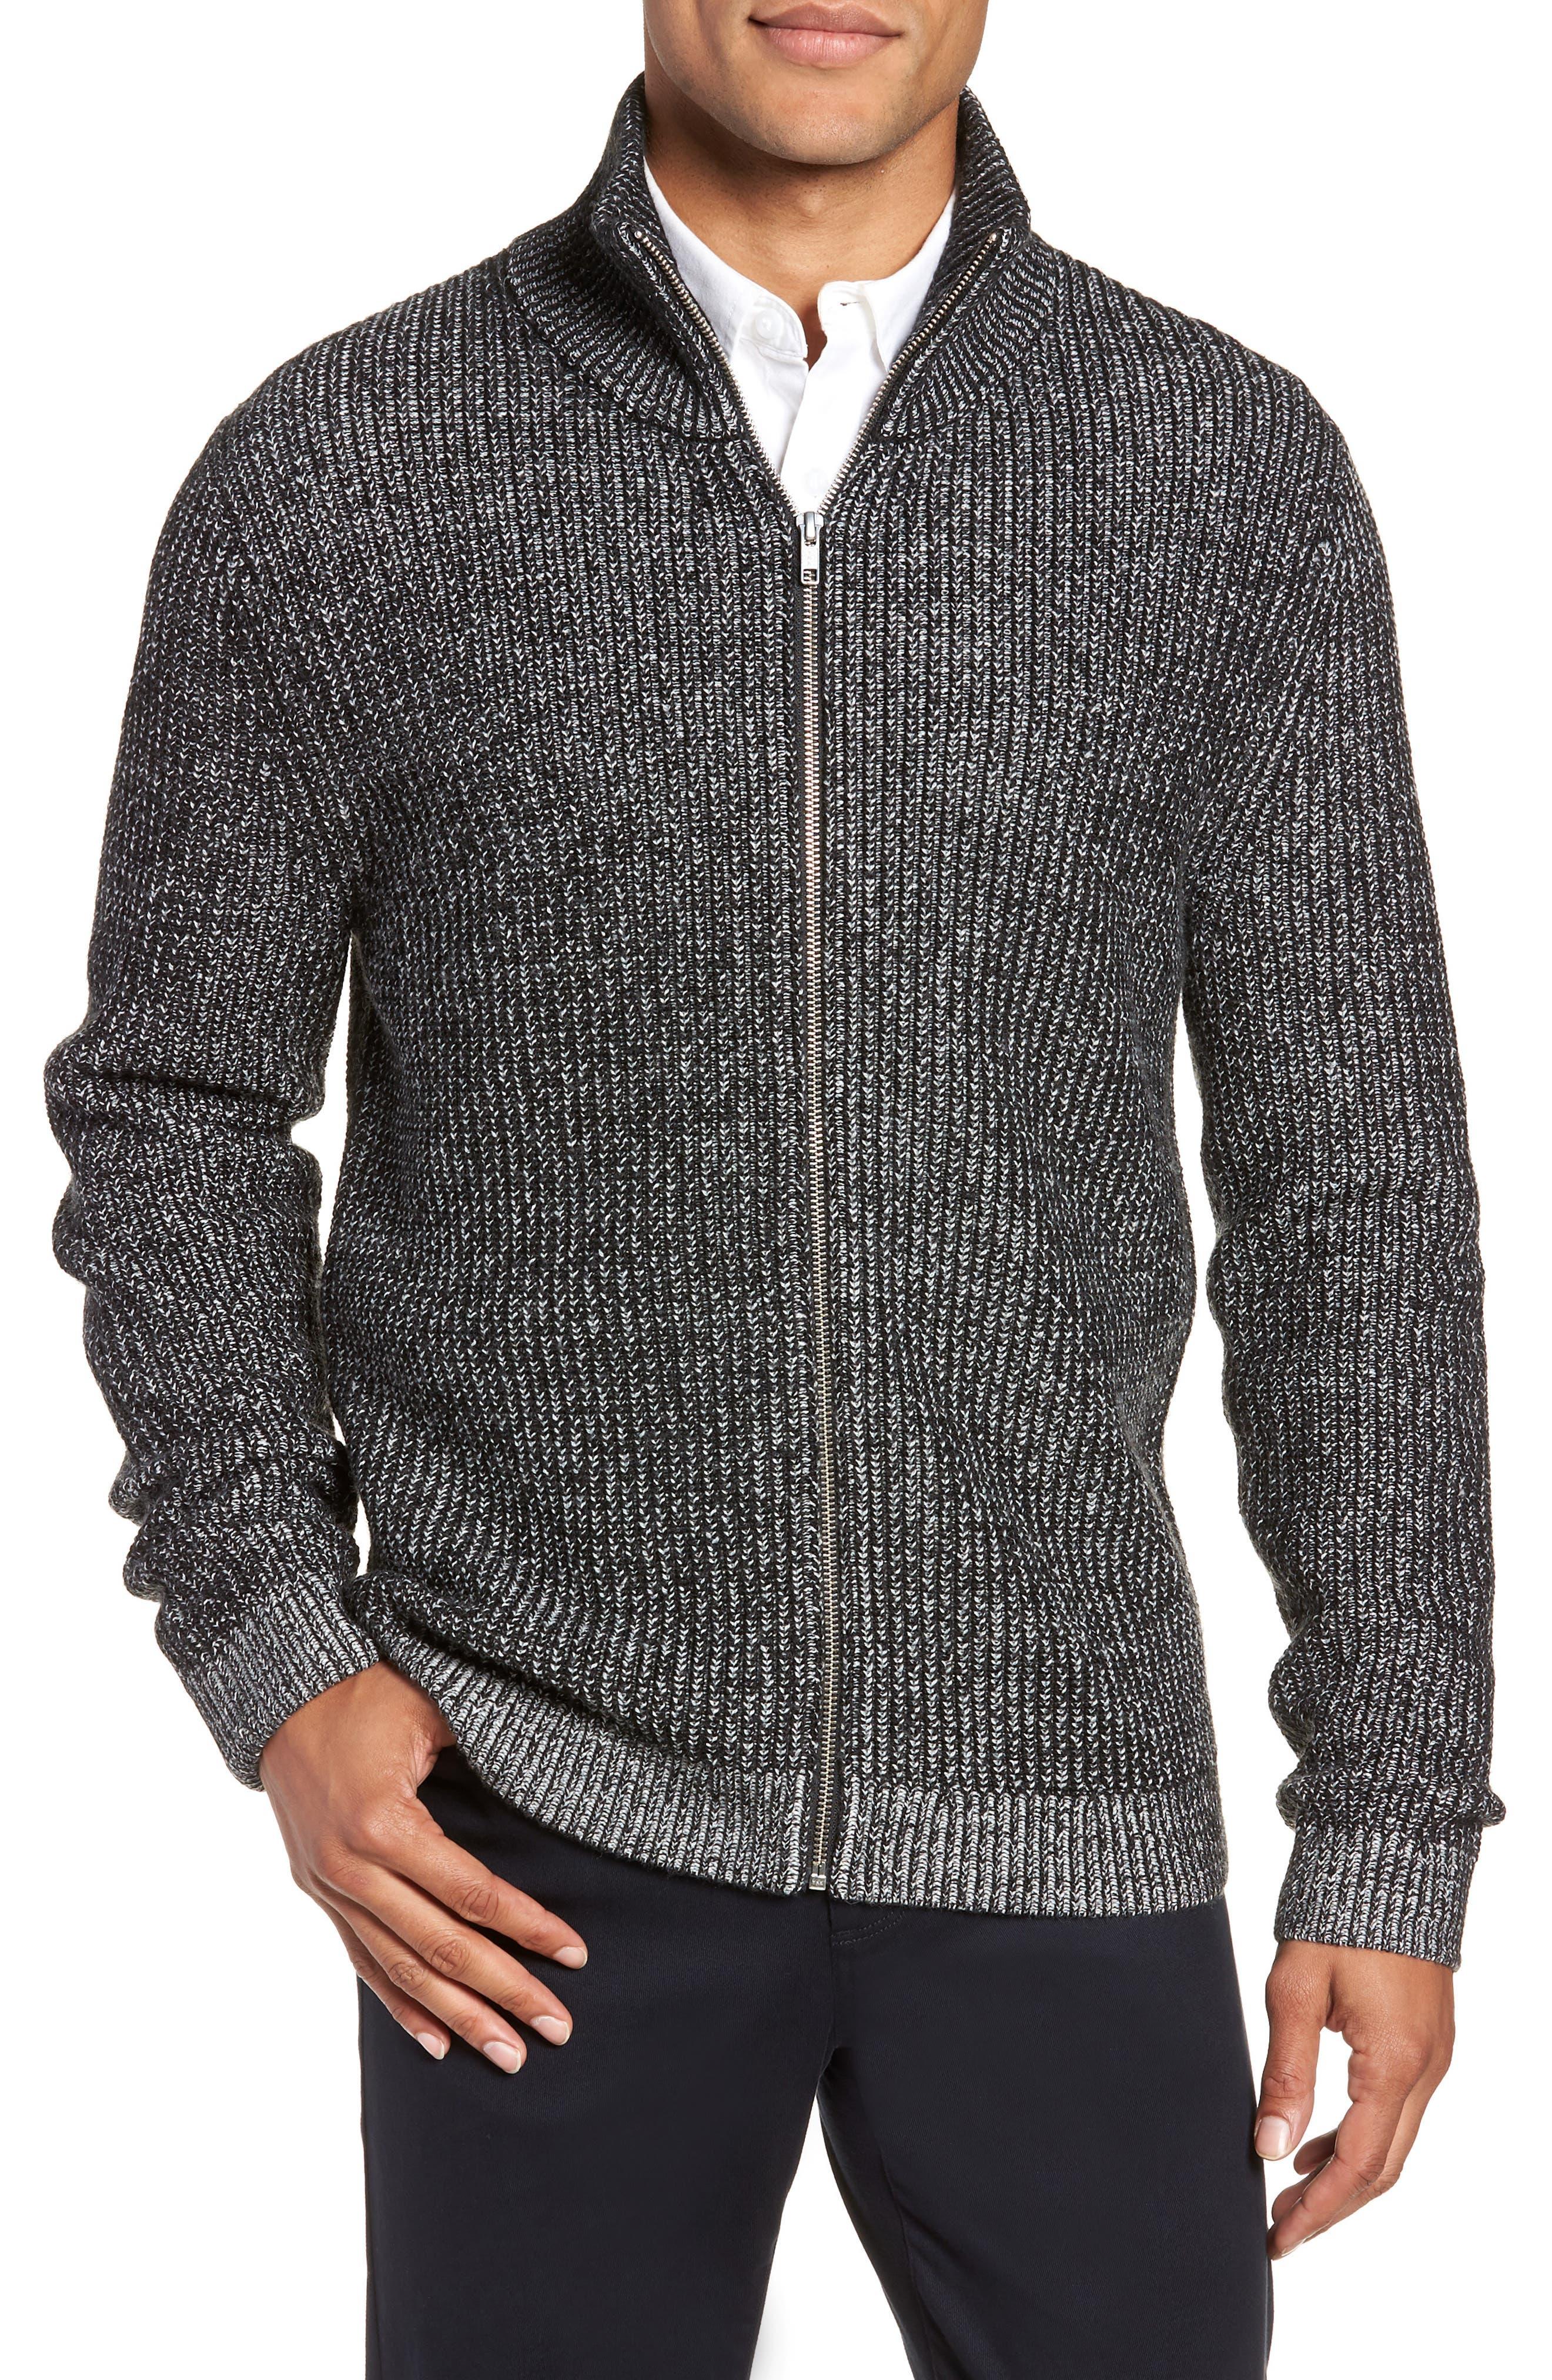 Calibrate Rib Knit Zip Sweater, Black